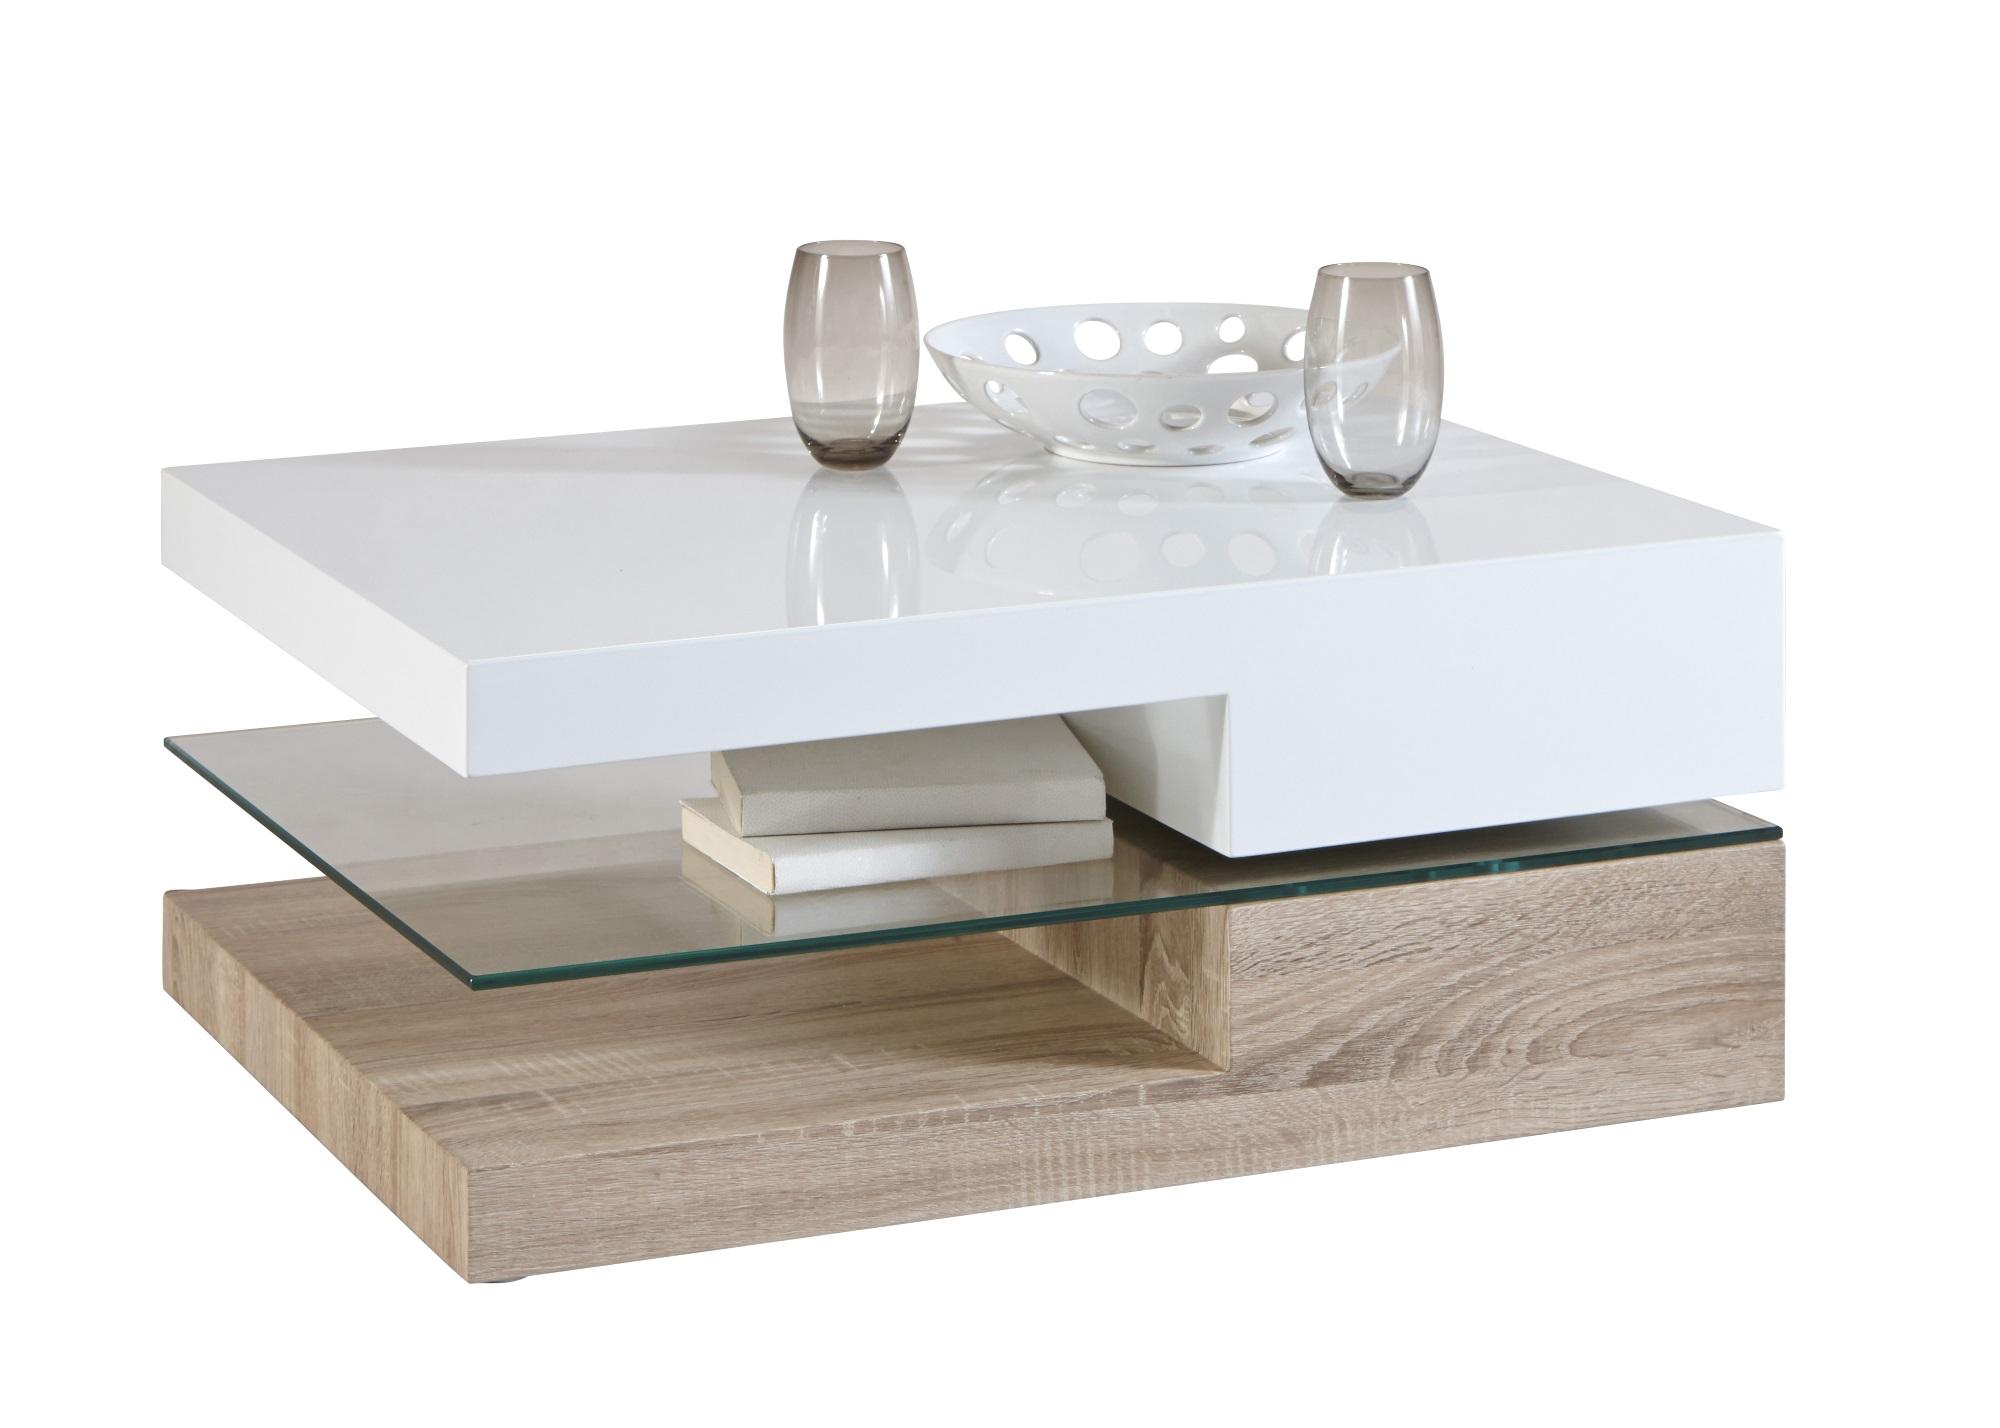 Eviane Boisamp; Verre Basse Rectangulaire Table Contemporaine rshQtd